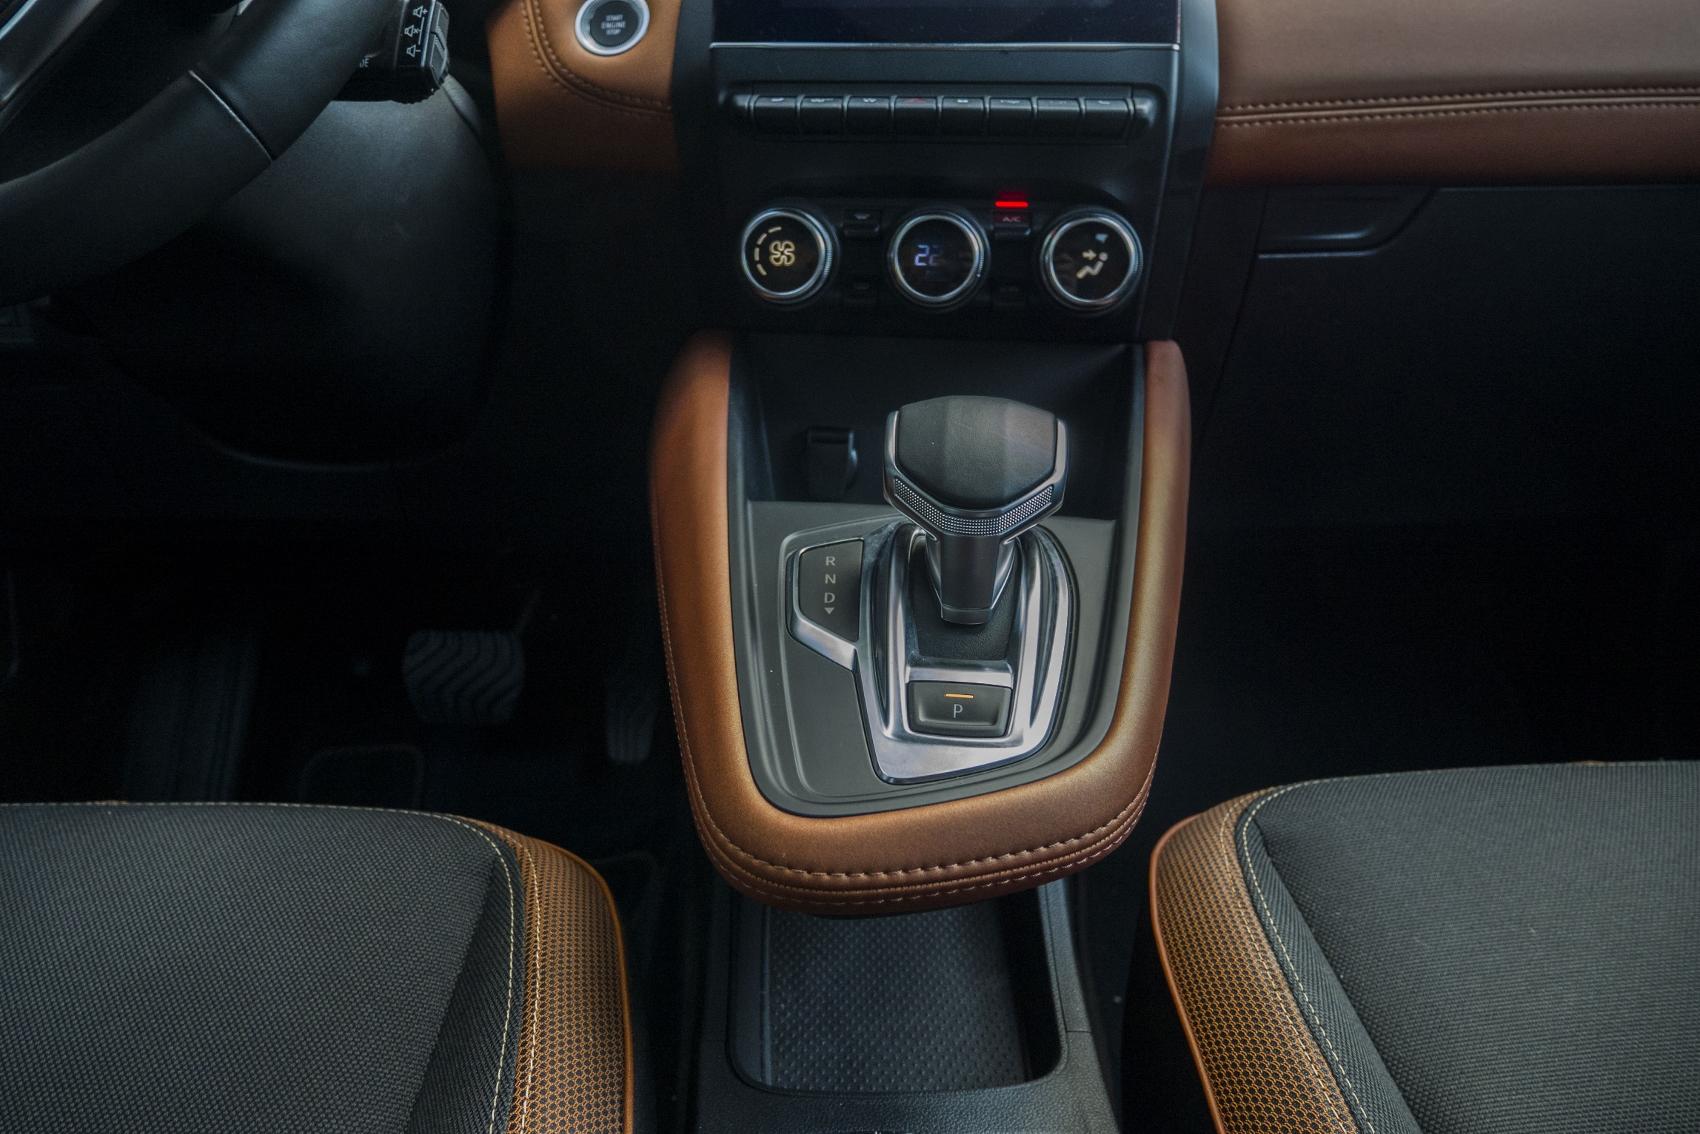 Test: V interiéri sa Renault Captur tvári ako o triedu drahšie auto KGqRsnXj3C renault-captur-23